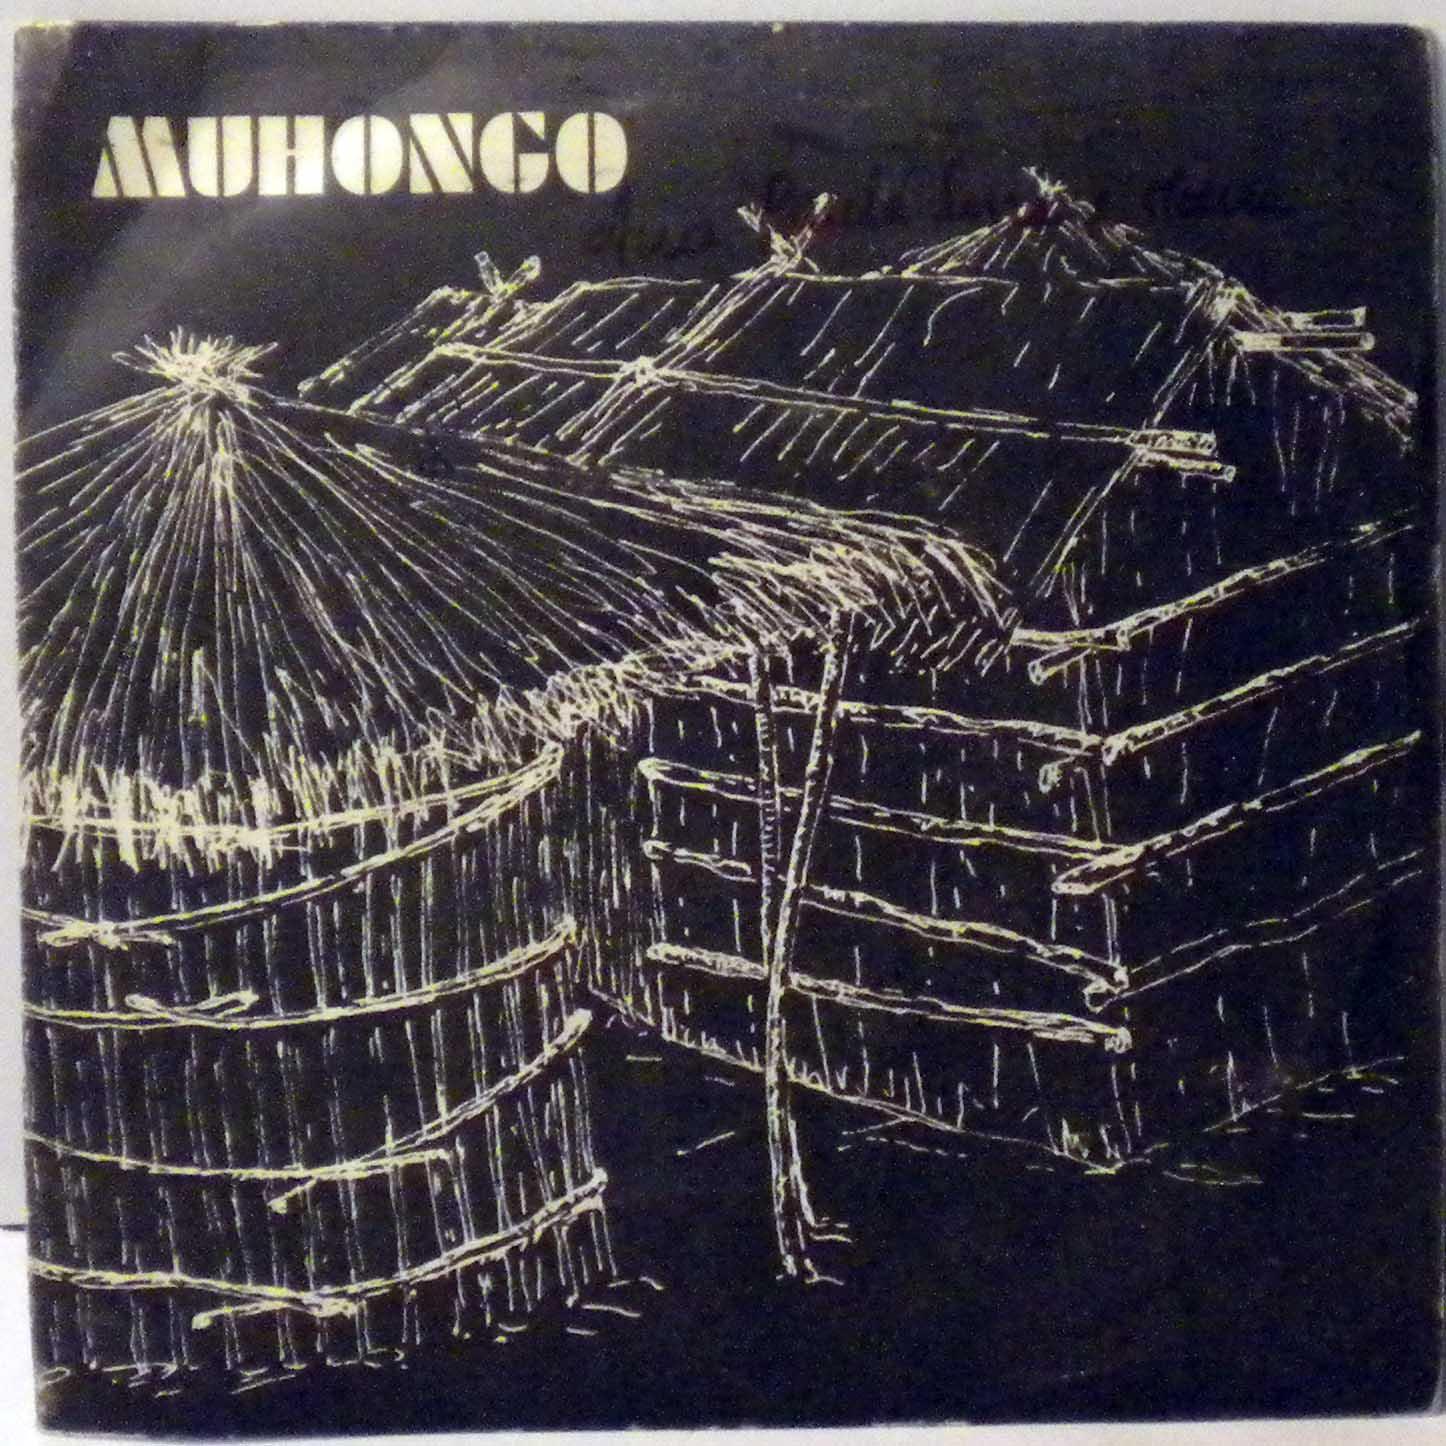 MUHONGO - Falsos amigos / N'ga kunu m'butu - 7inch (SP)